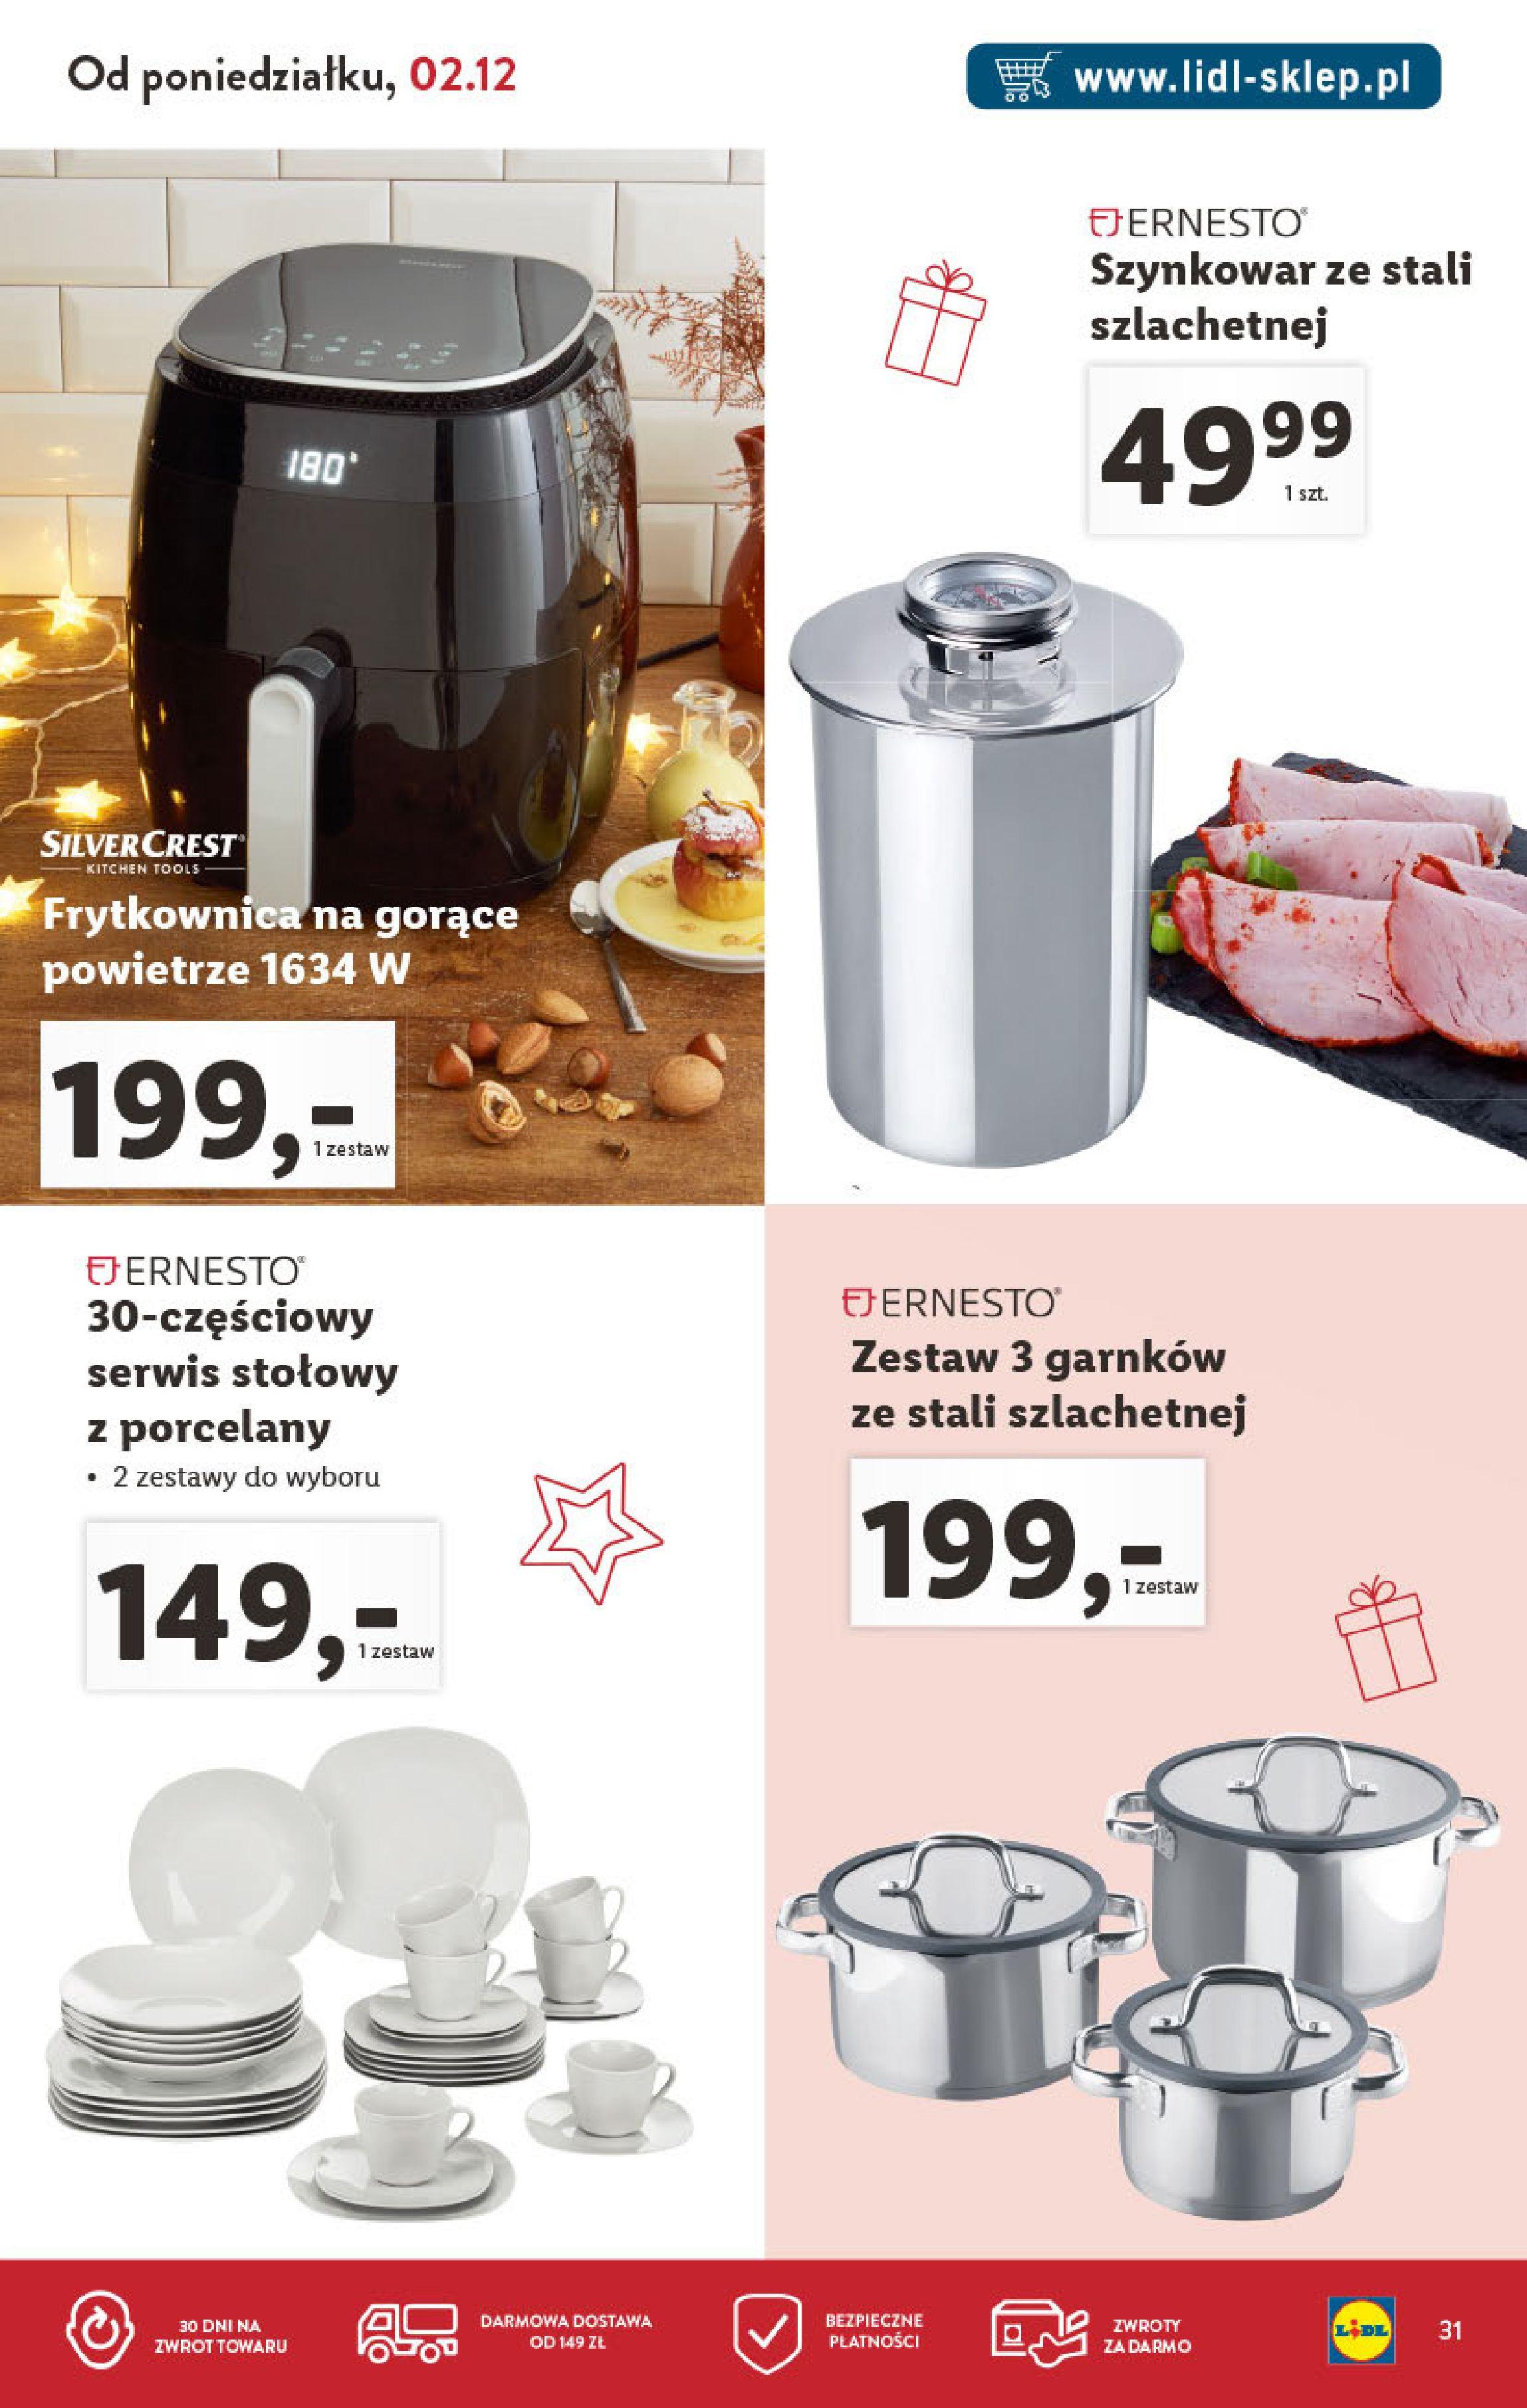 Gazetka Lidl - Katalog Online-13.10.2019-02.12.2019-page-31